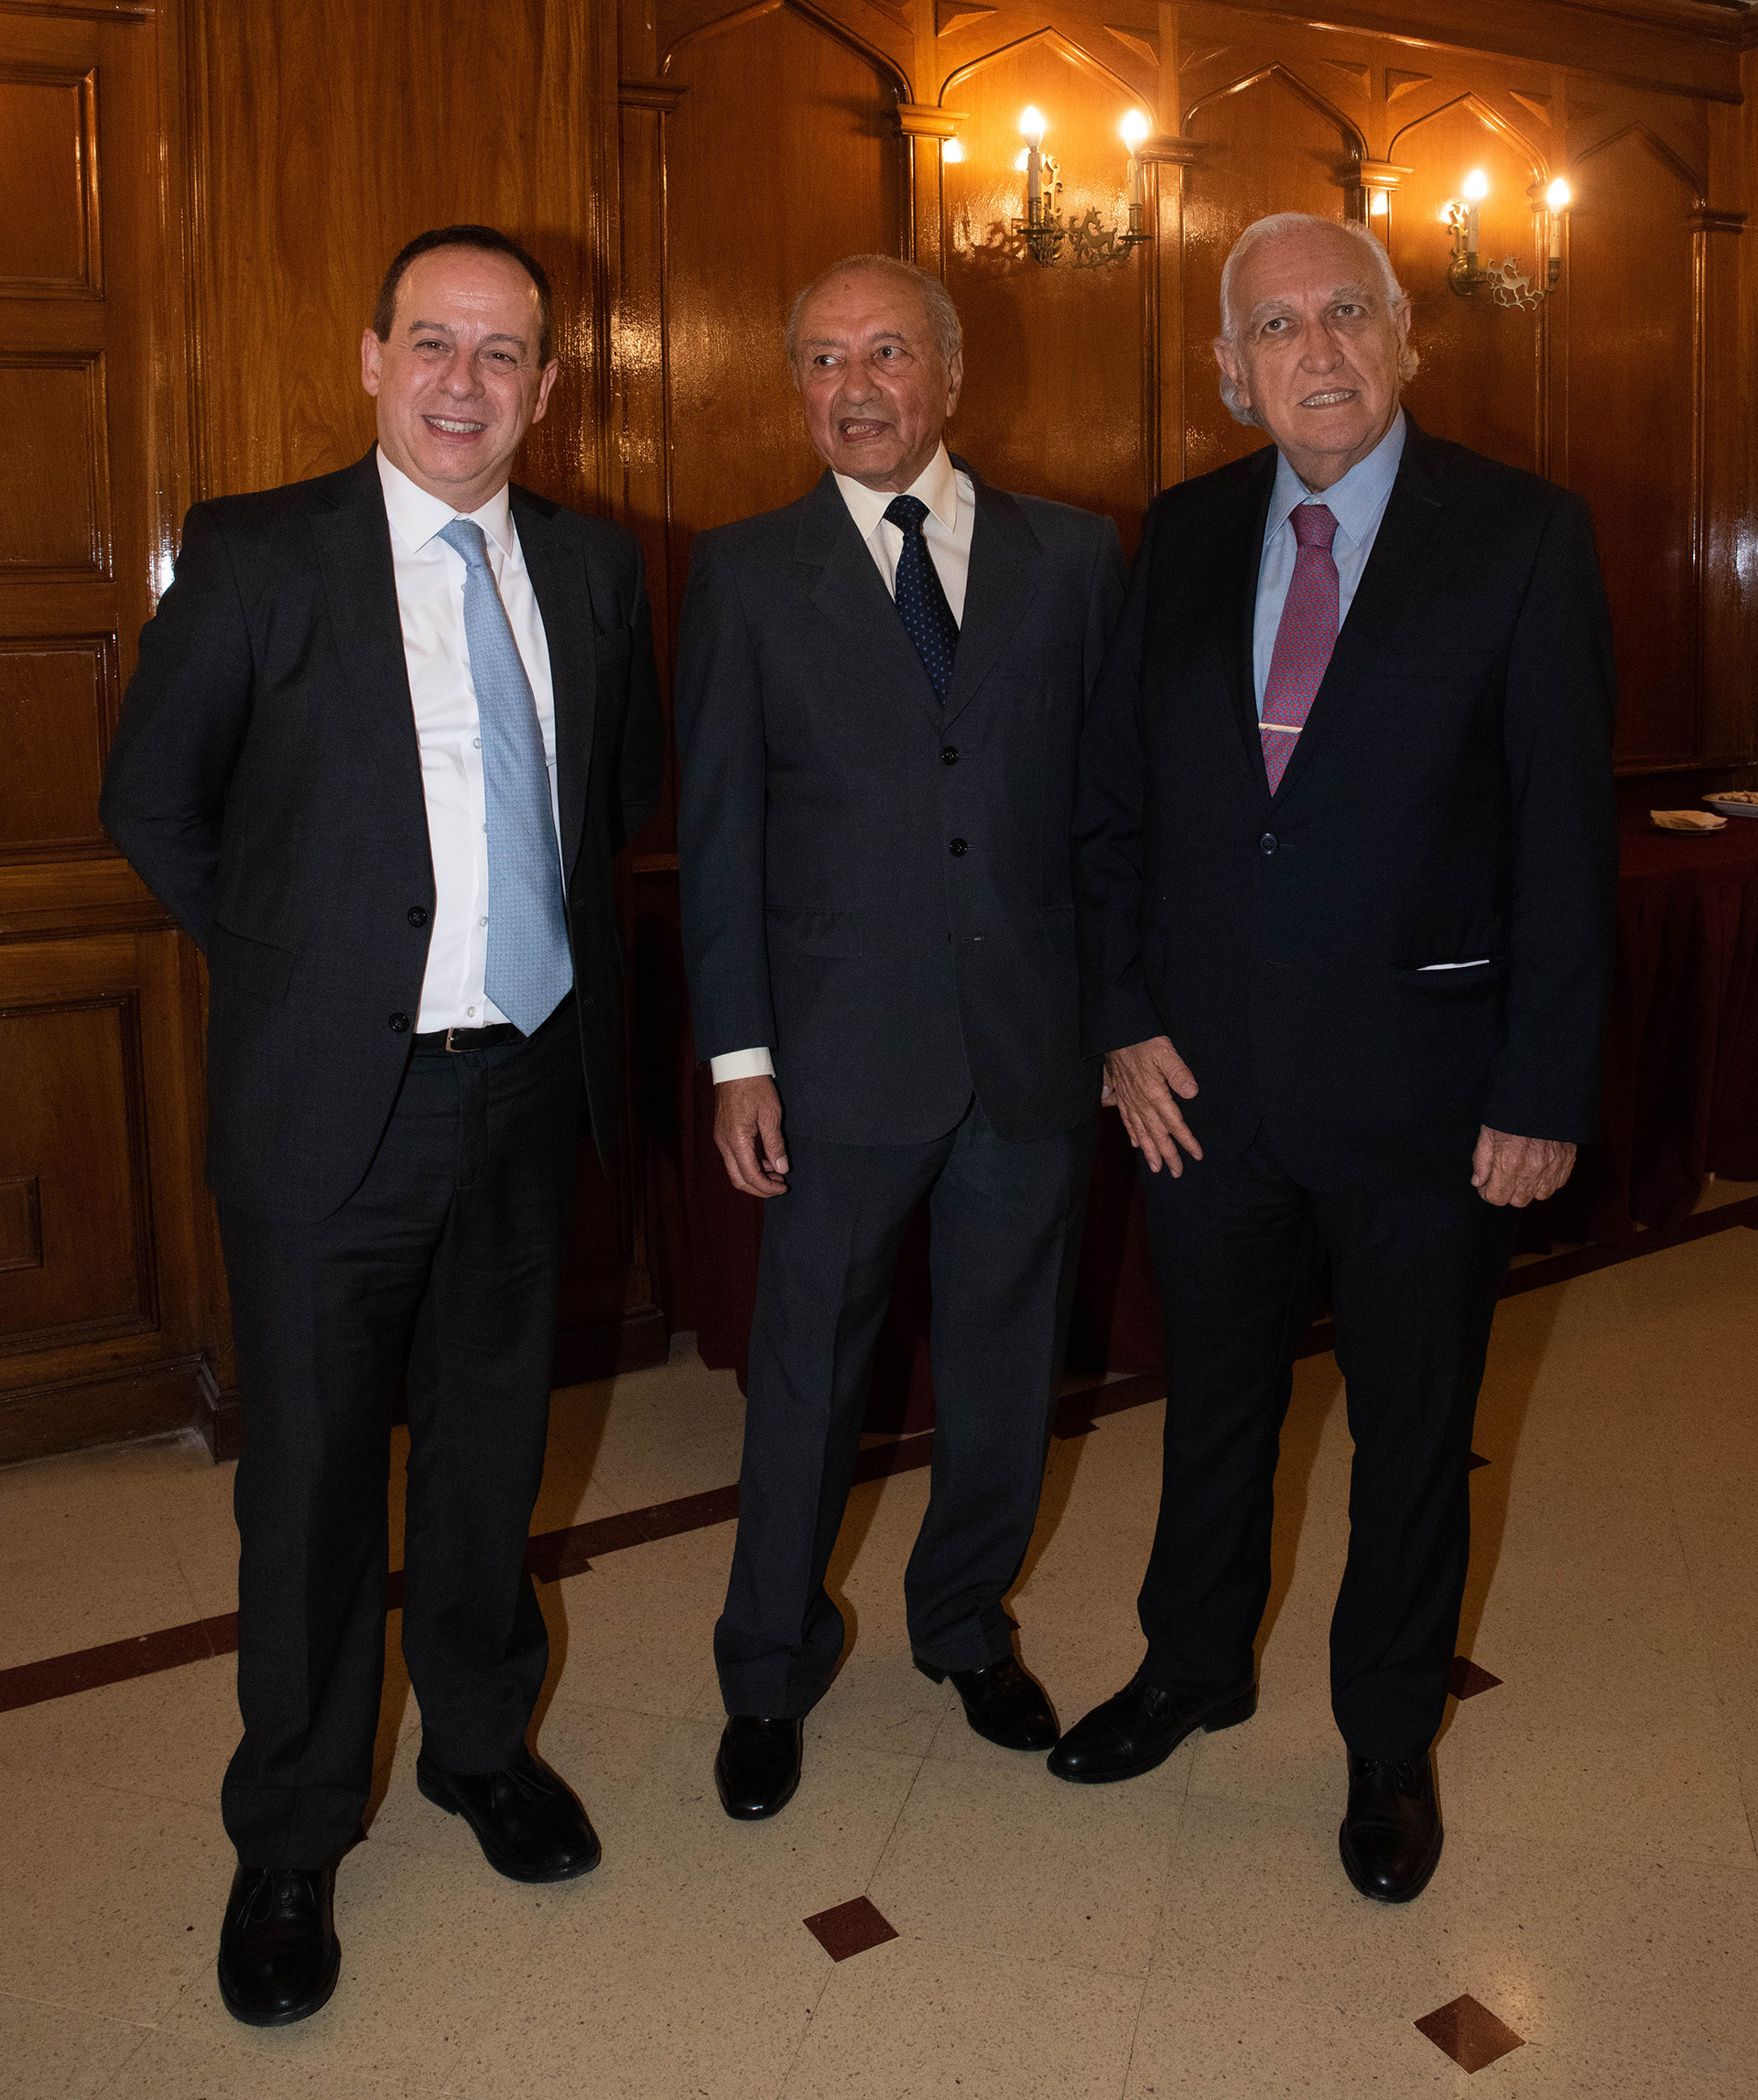 Martín Etchevers, Eduardo Menem y Ricardo Gil Lavedra